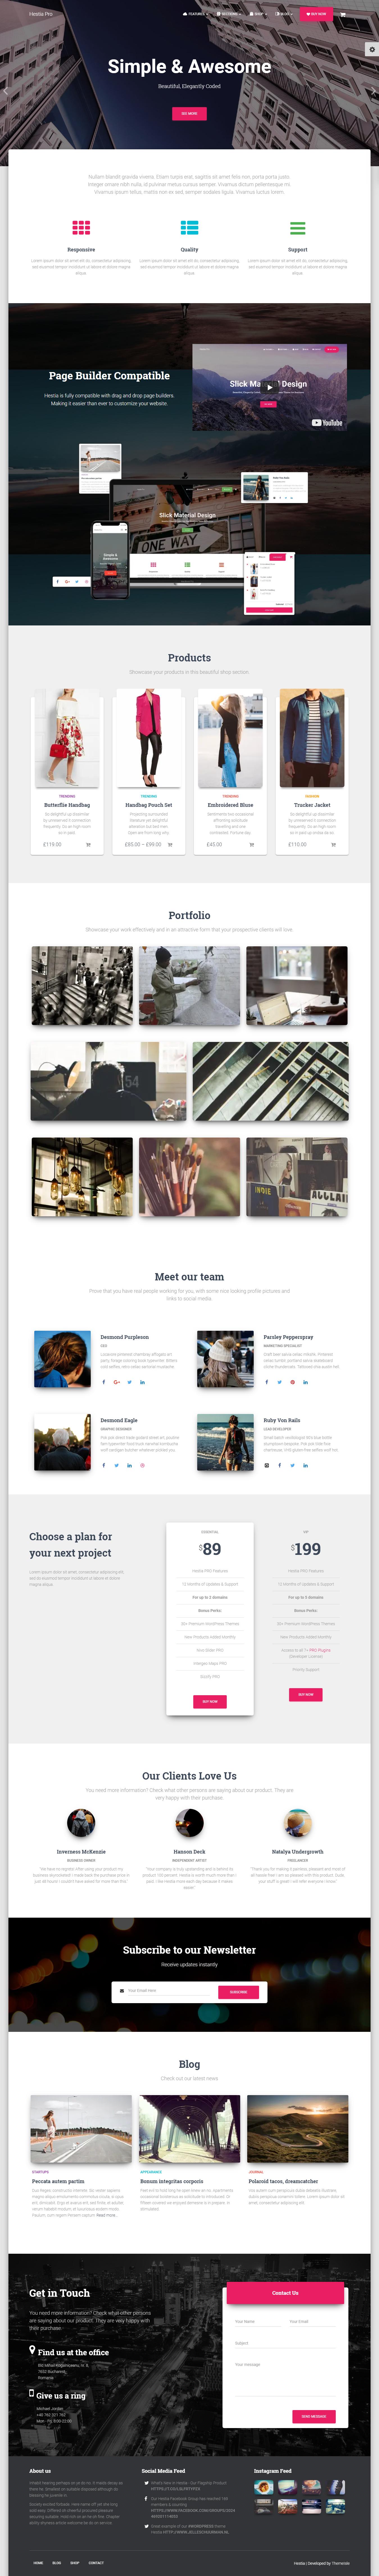 Hestia Pro - Premium Agency WordPress Themes and Templates